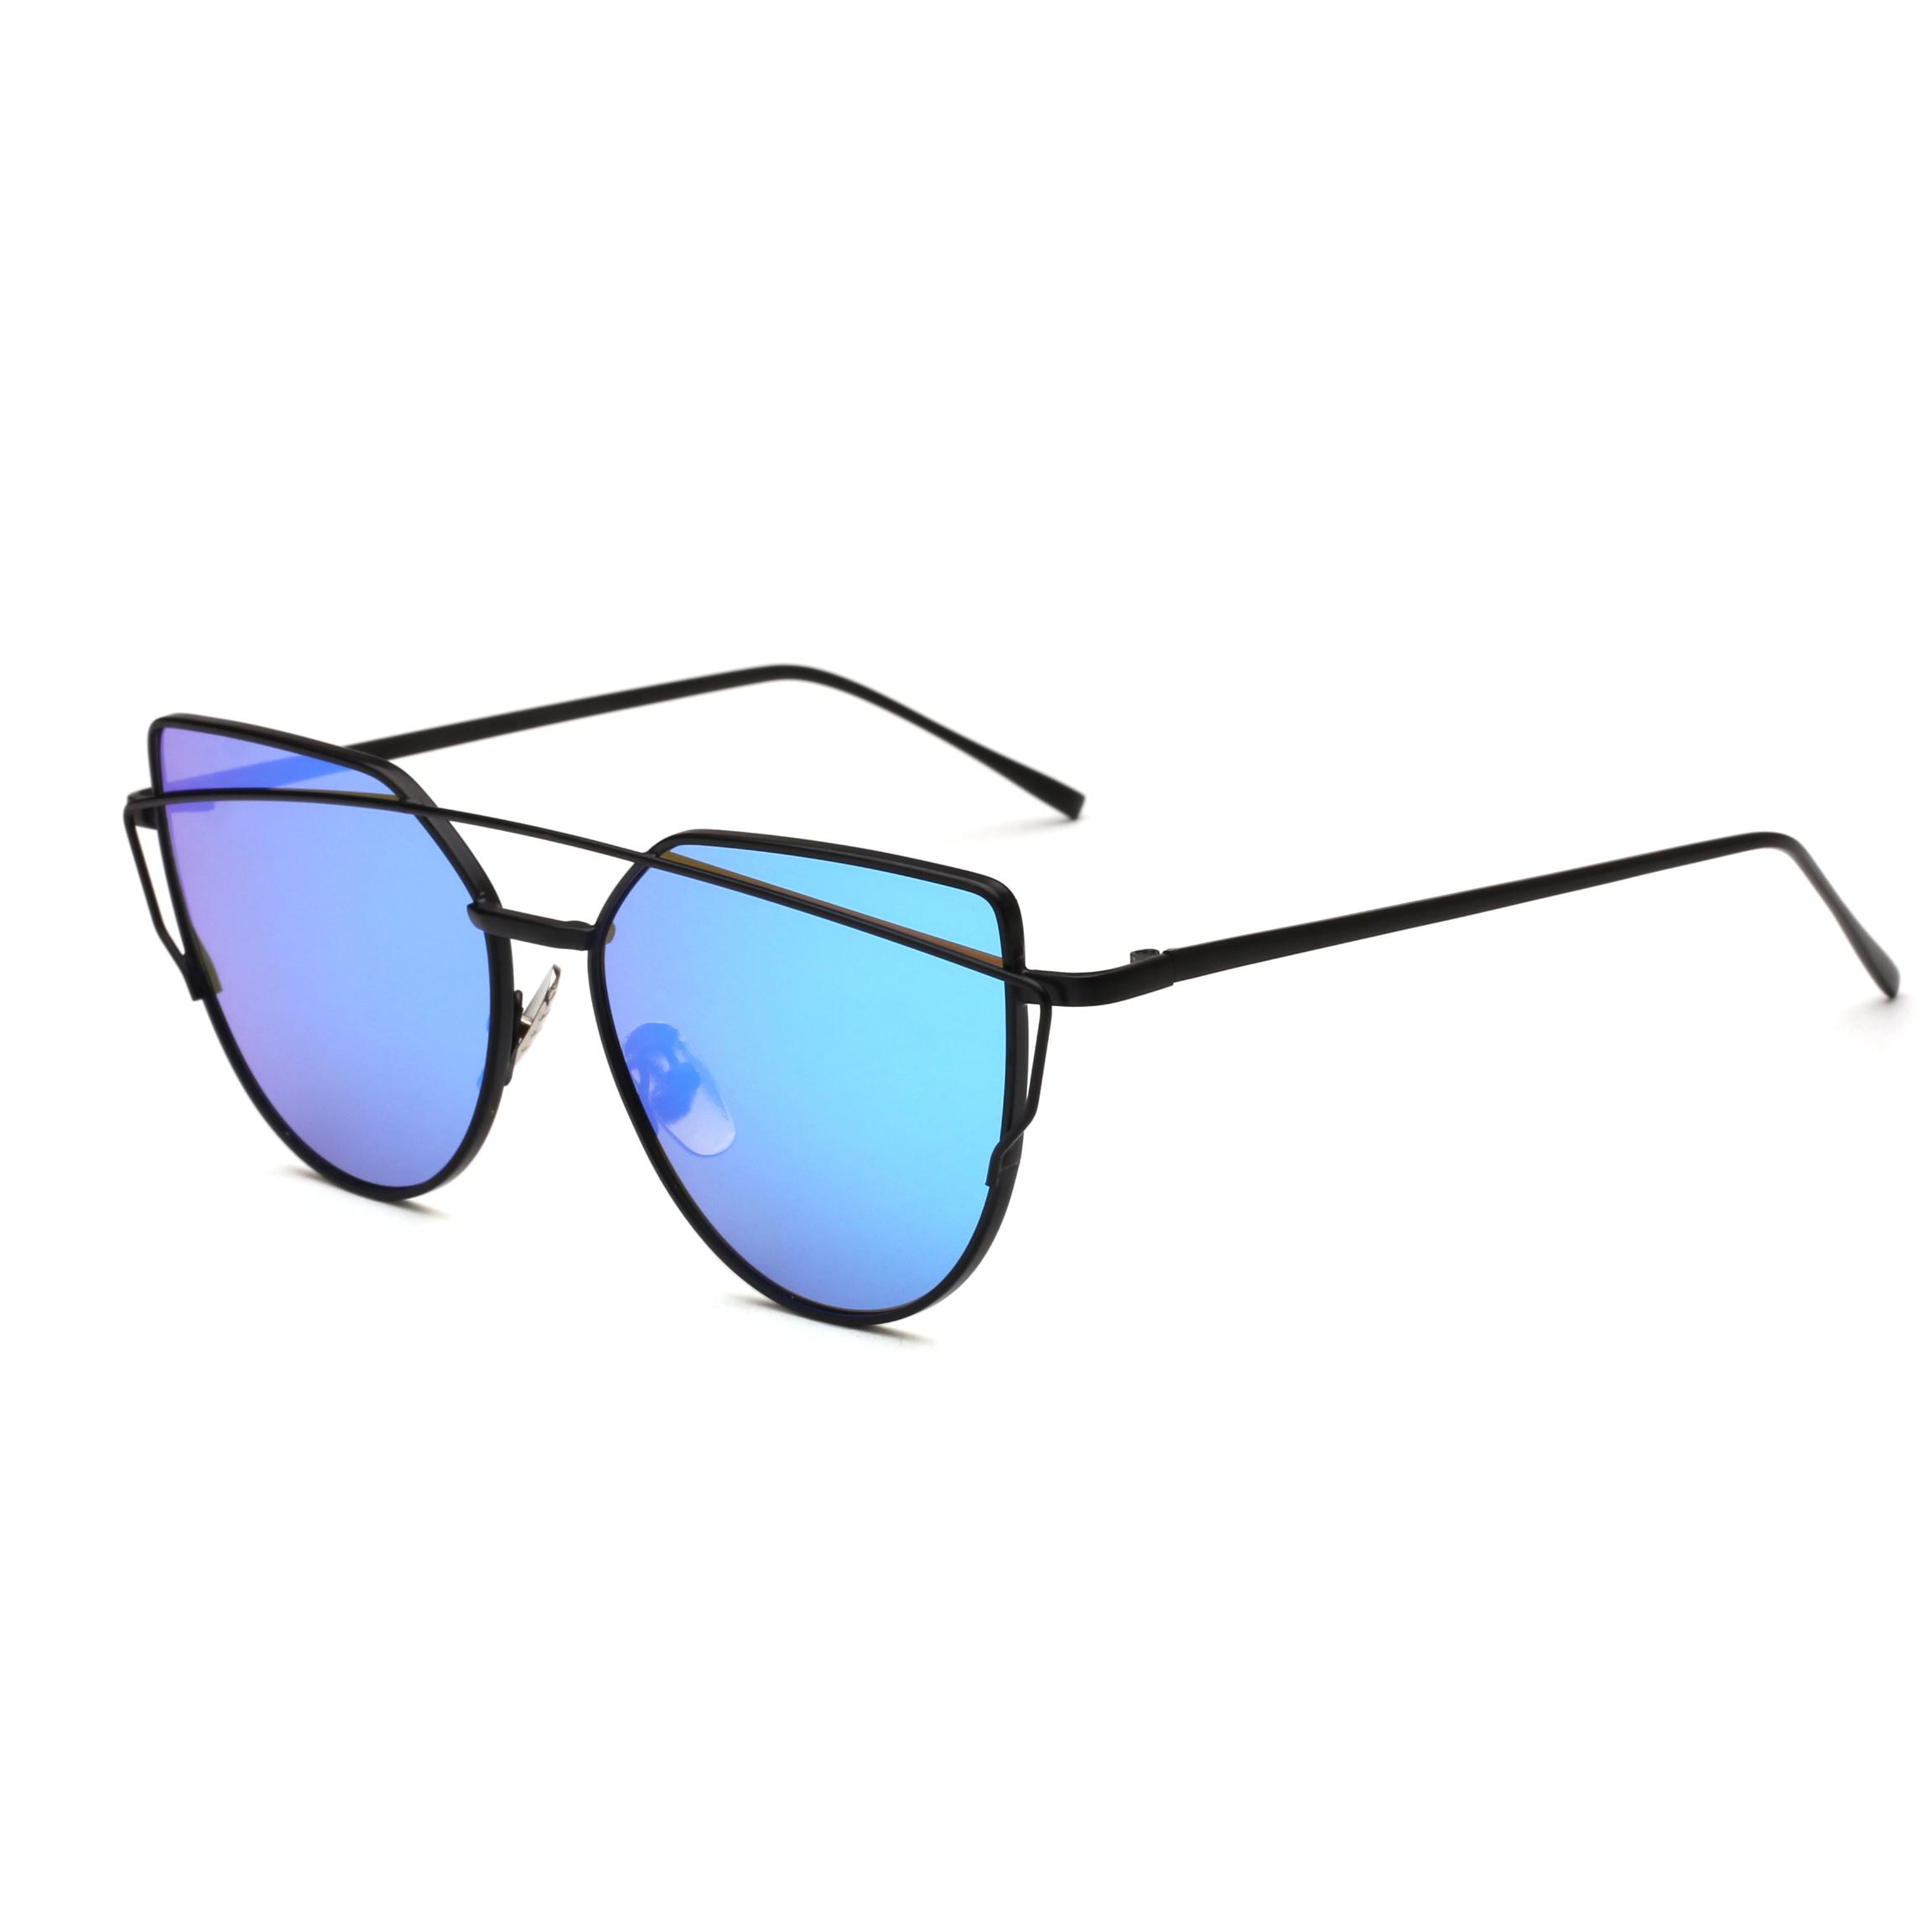 47586caa4a744 مصادر شركات تصنيع الصين النظارات الشمسية والصين النظارات الشمسية في  Alibaba.com